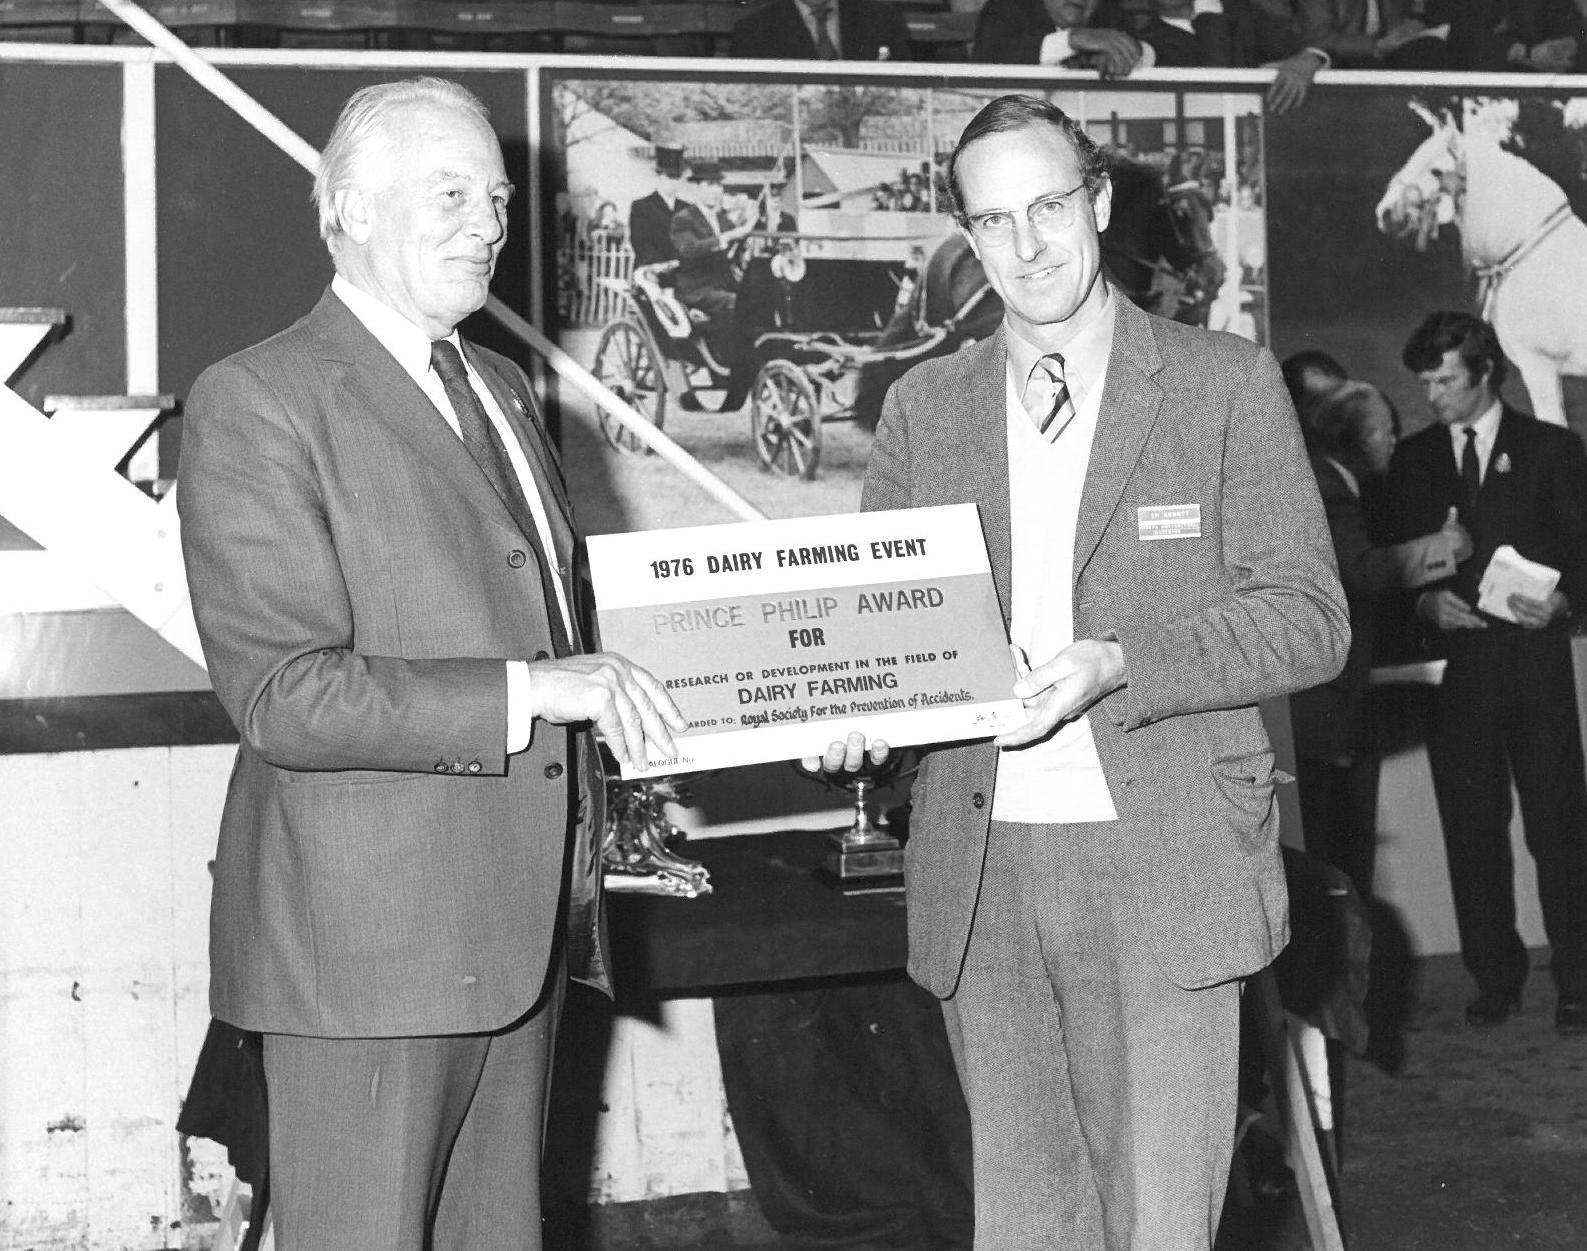 1976 Prince Philip Award